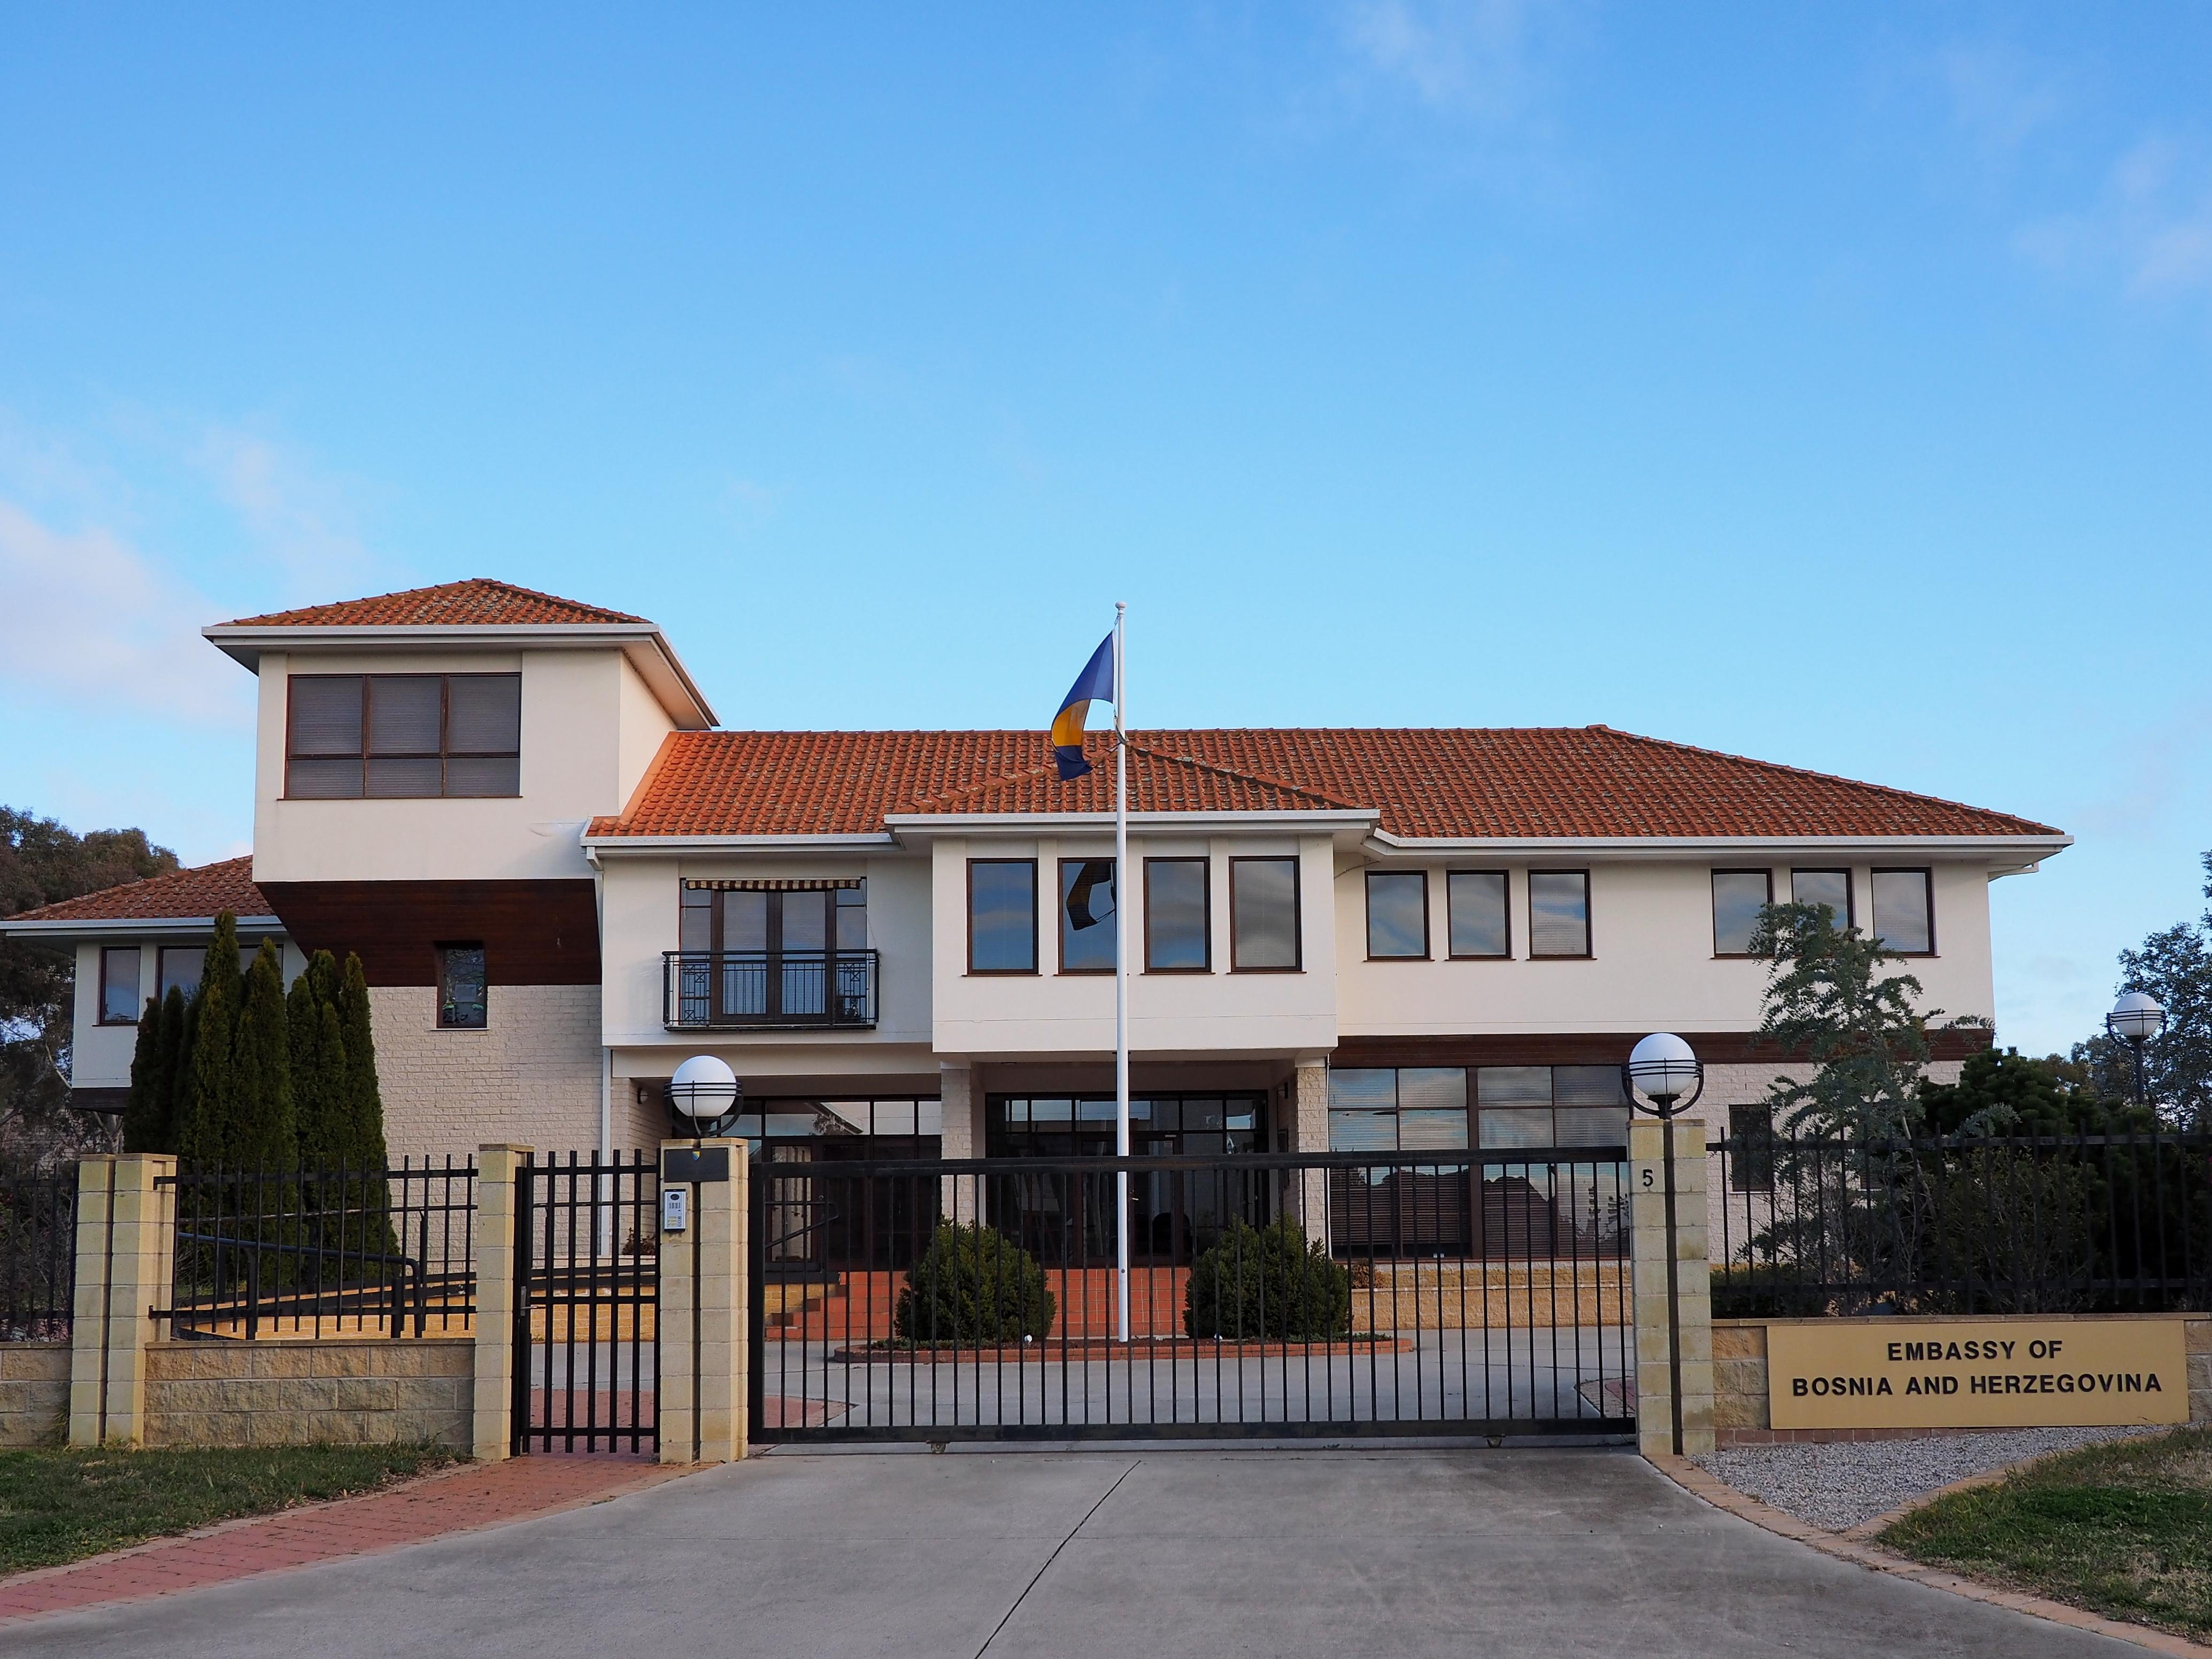 Ambasada Bosne I Hercegovine U Canberri Wikipedia